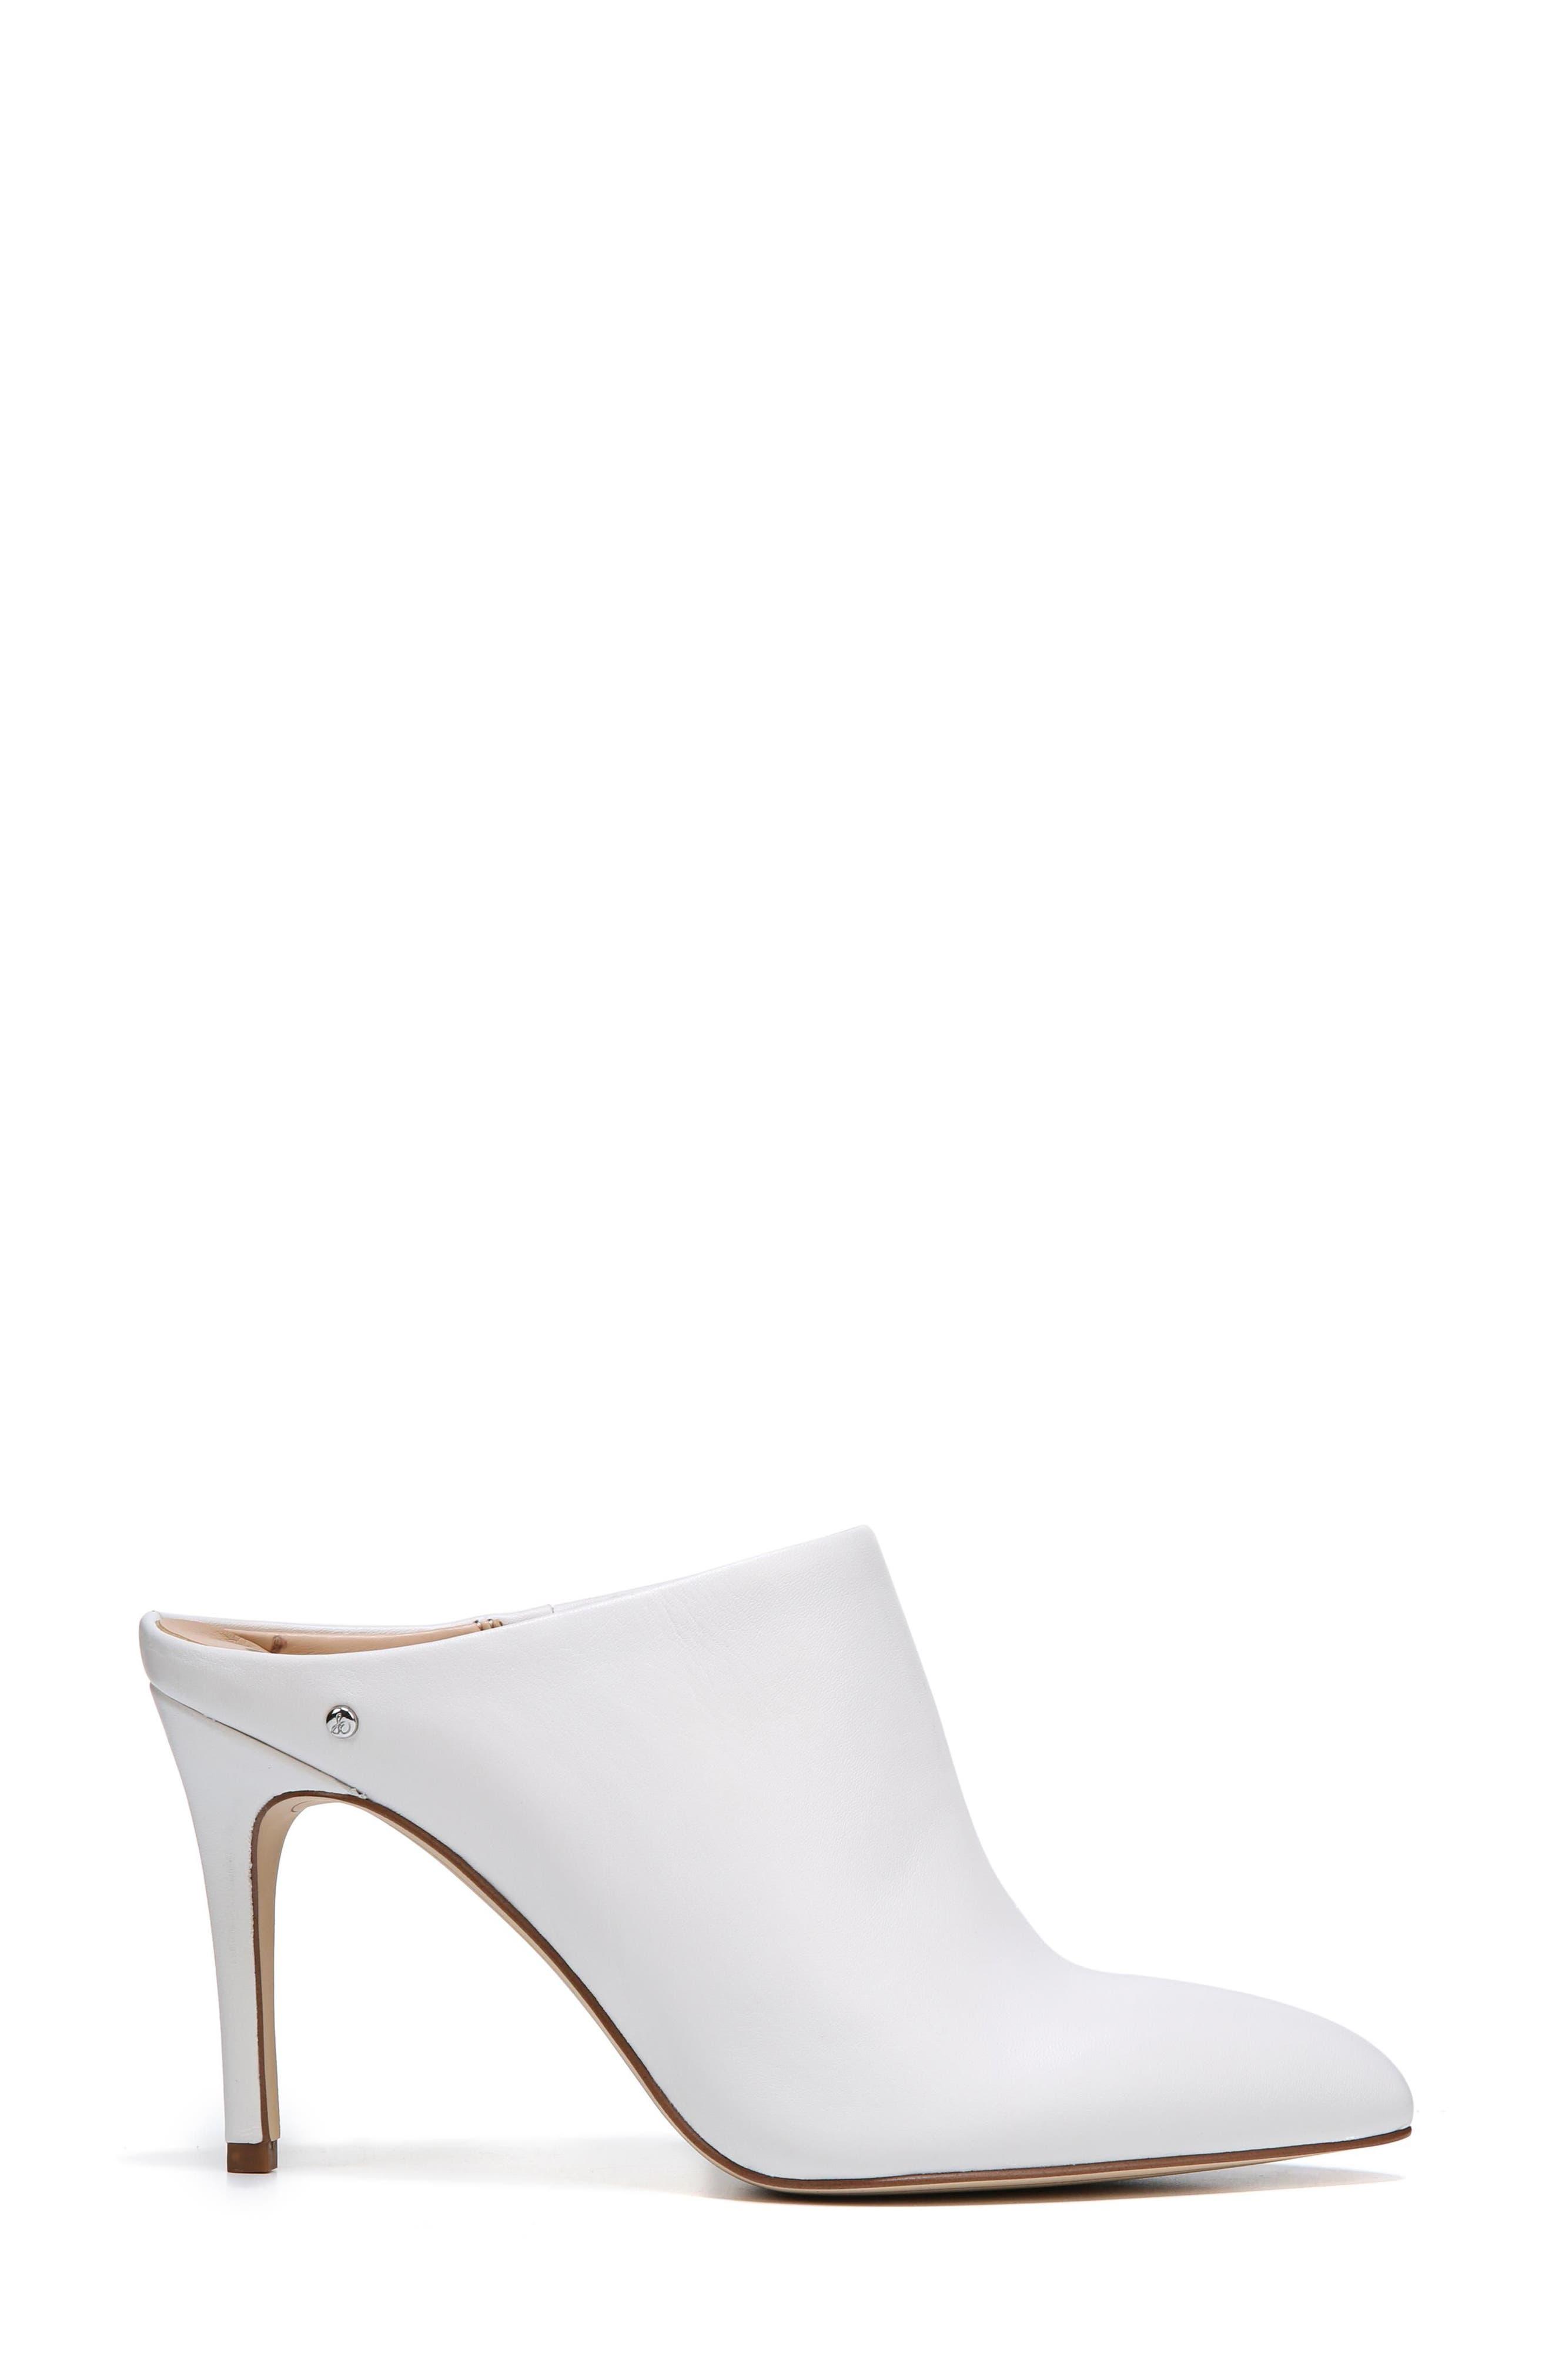 Oran Mule,                             Alternate thumbnail 3, color,                             Bright White Nappa Leather